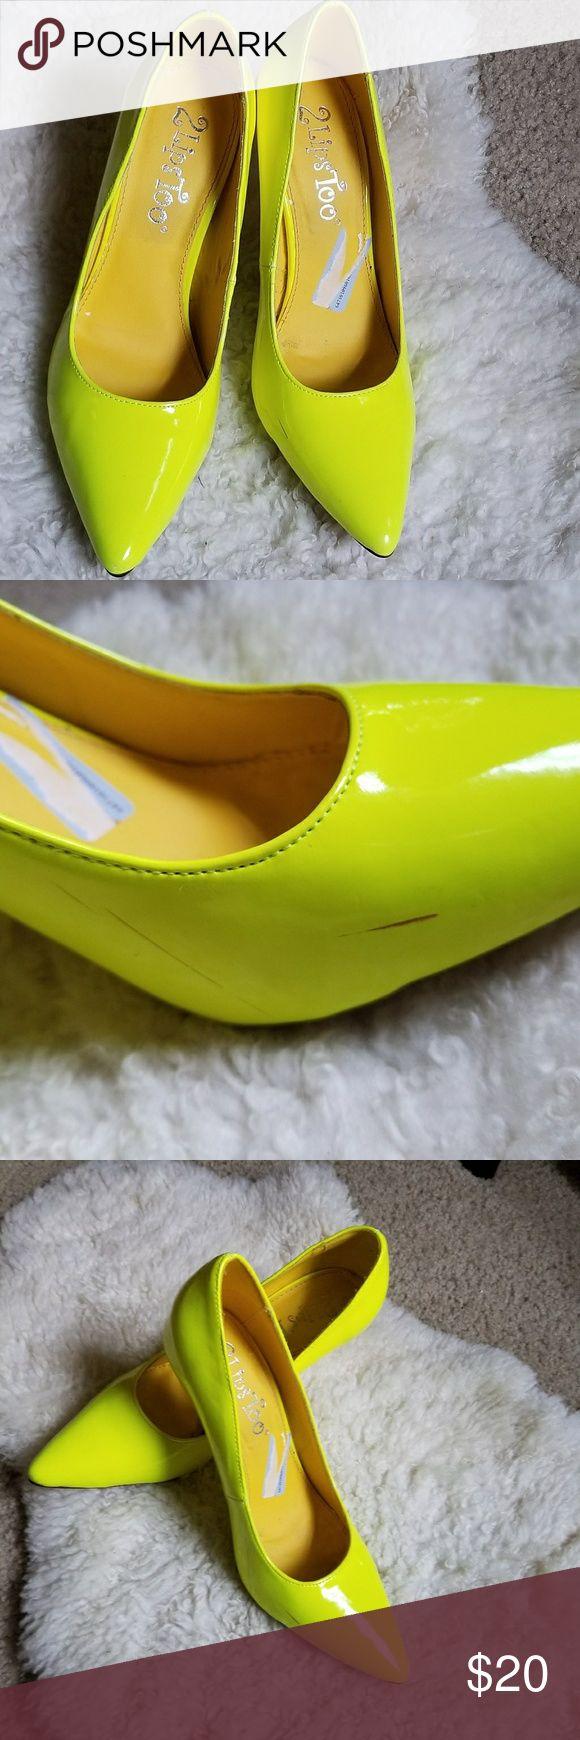 2 Lips Too Yellow Neon Pumps Yellow Neon Pumps 2 Lips Too Shoes Heels